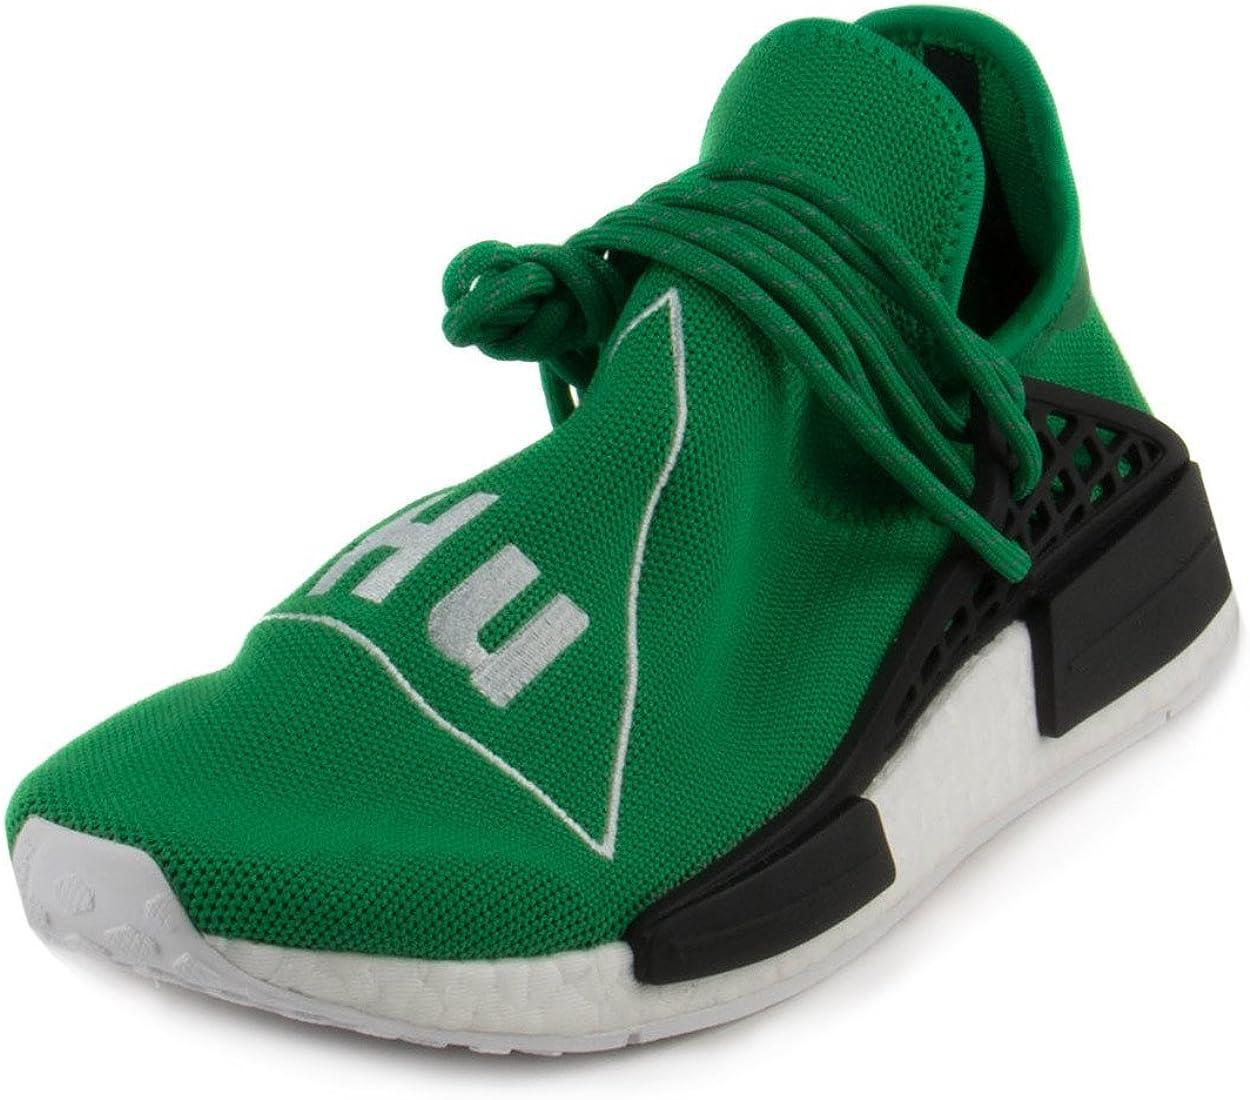 adidas Pw Human Race NMD 'Pharrell